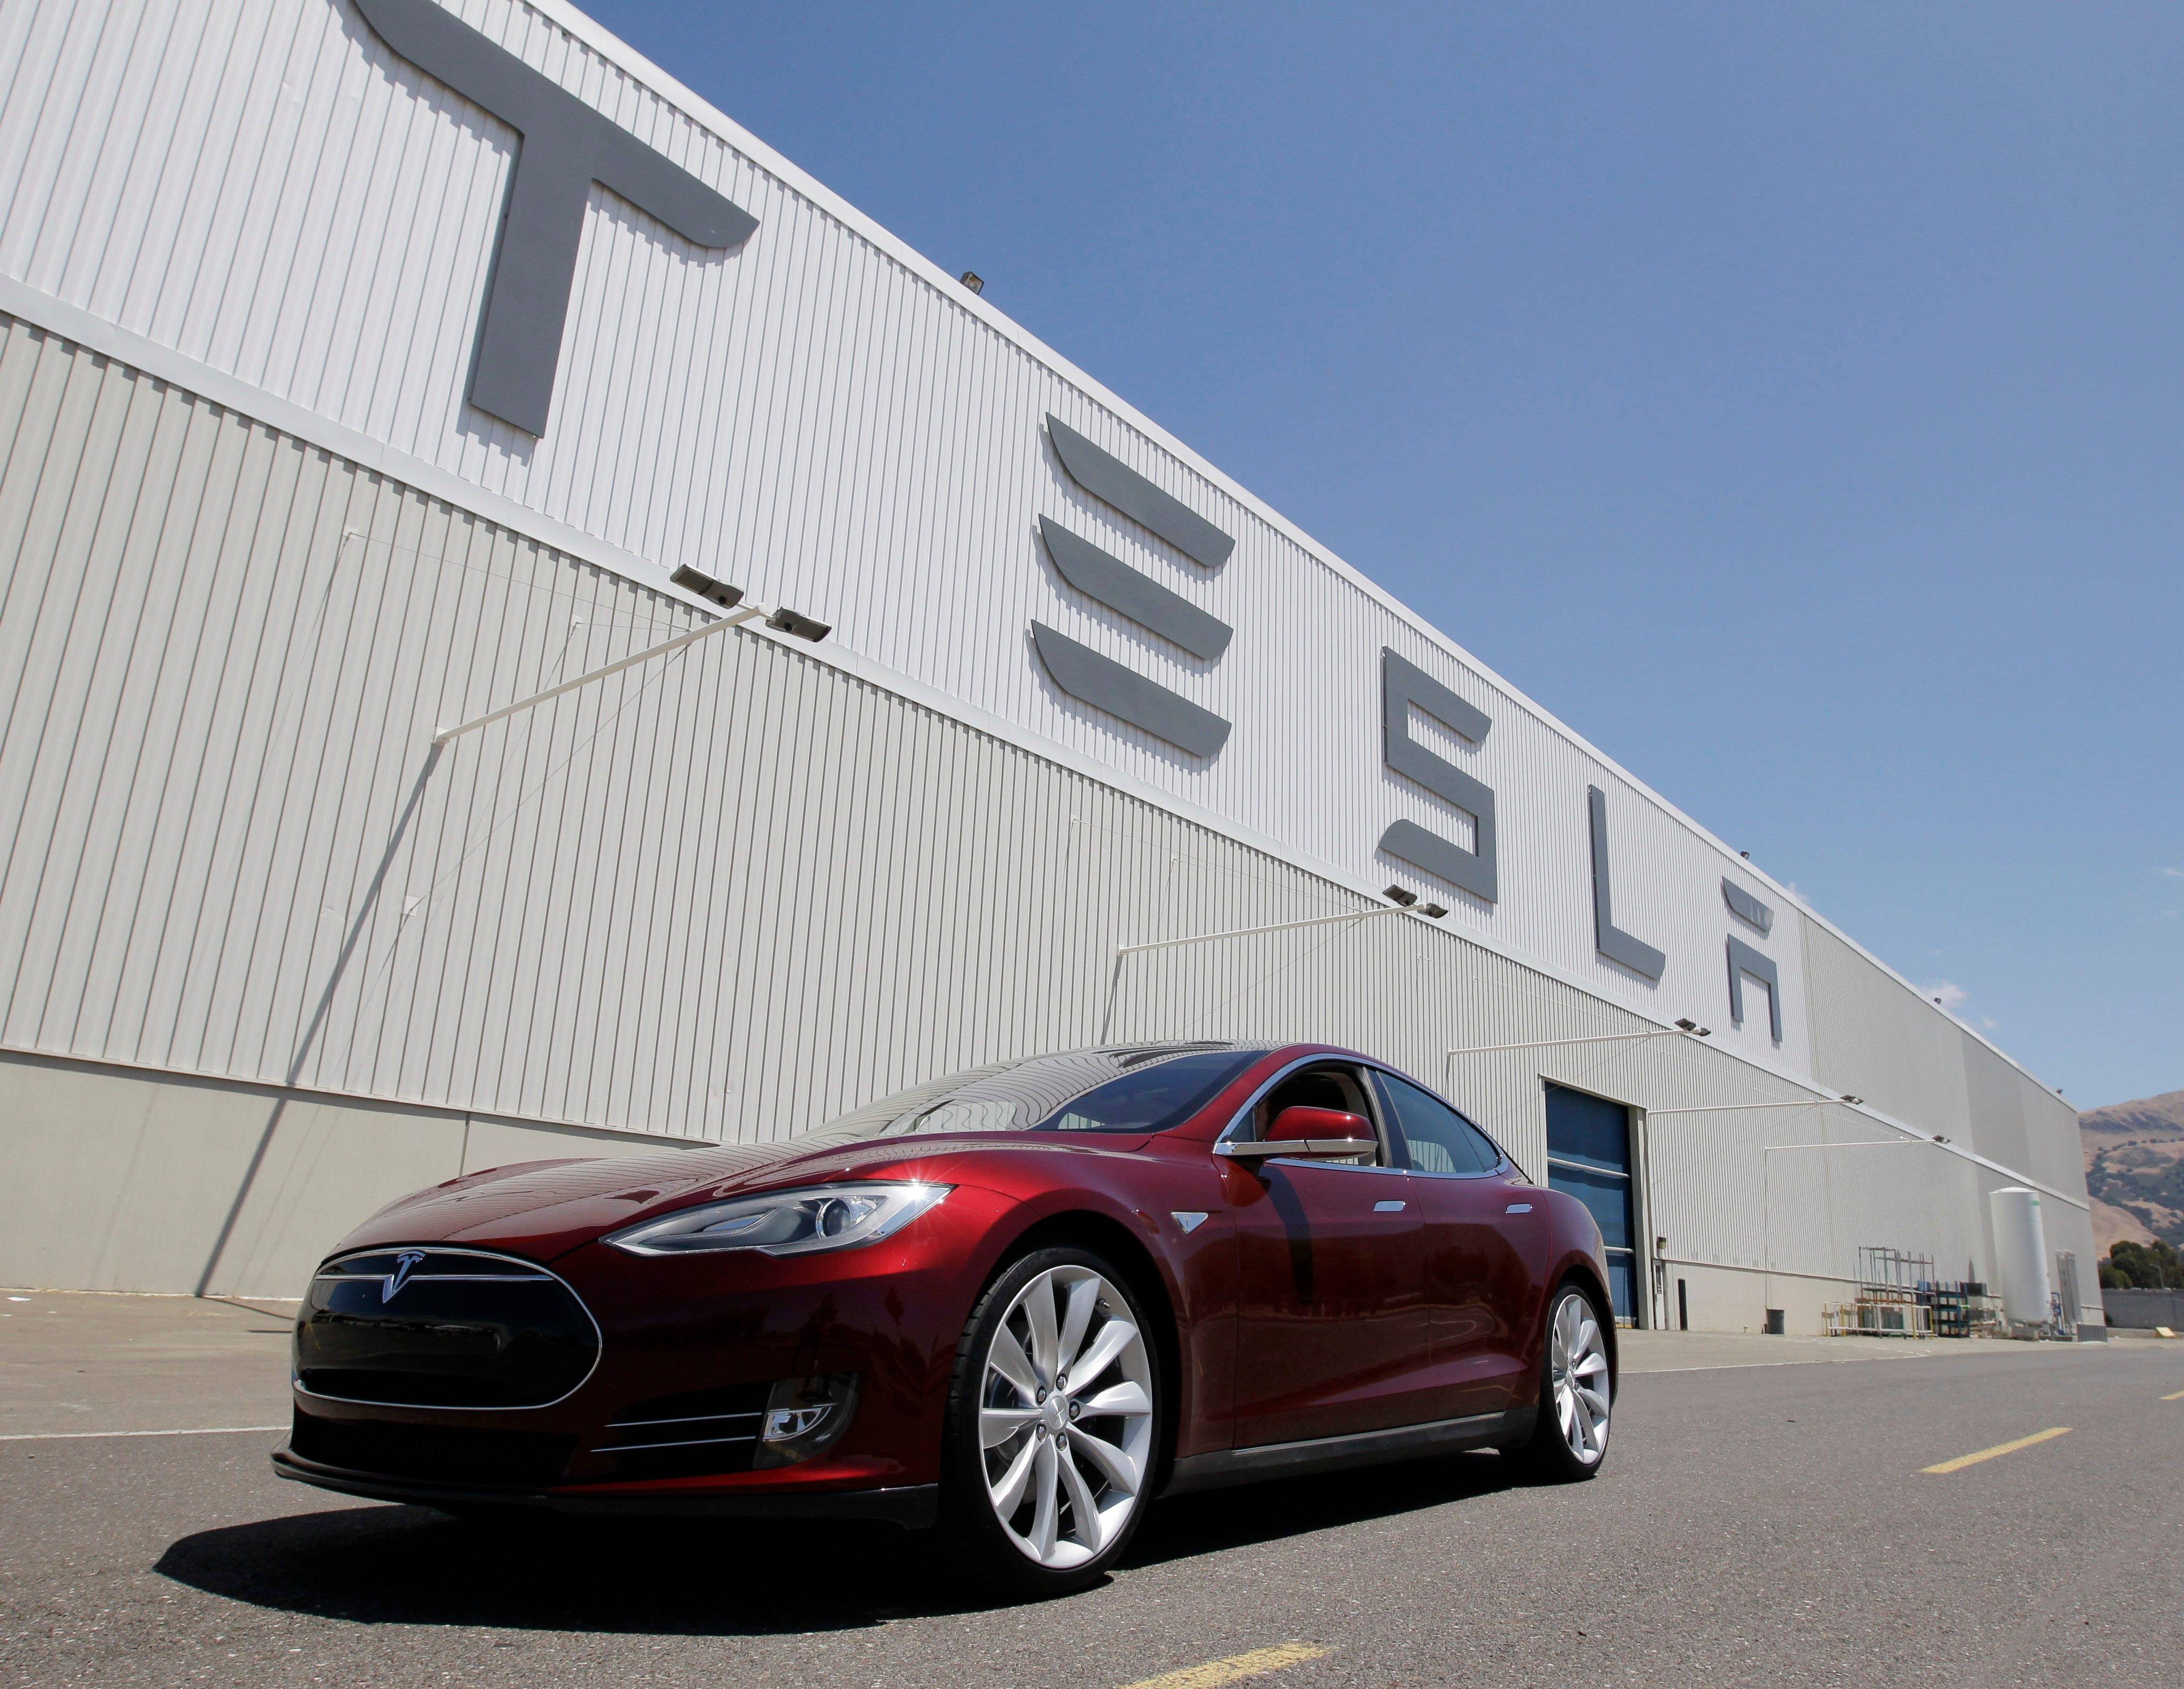 Tesla's 'Autopilot' feature probed after fatal crash | krem com